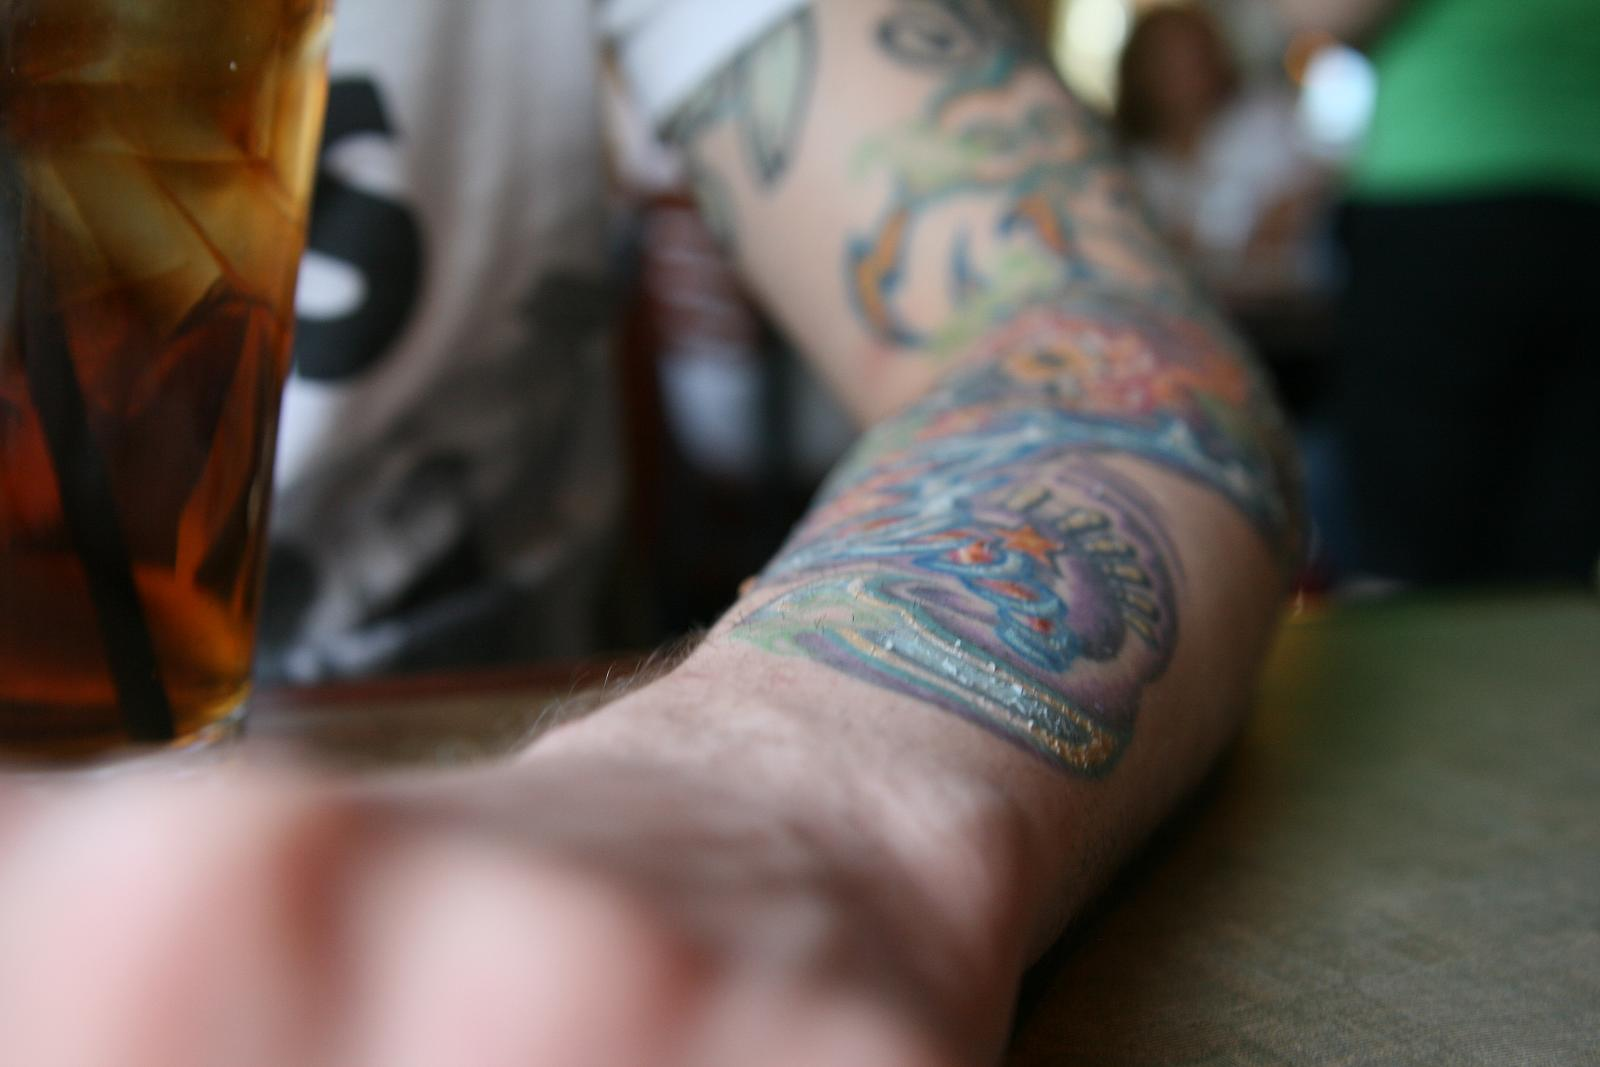 peeling and healing tattoo - tattoo peel